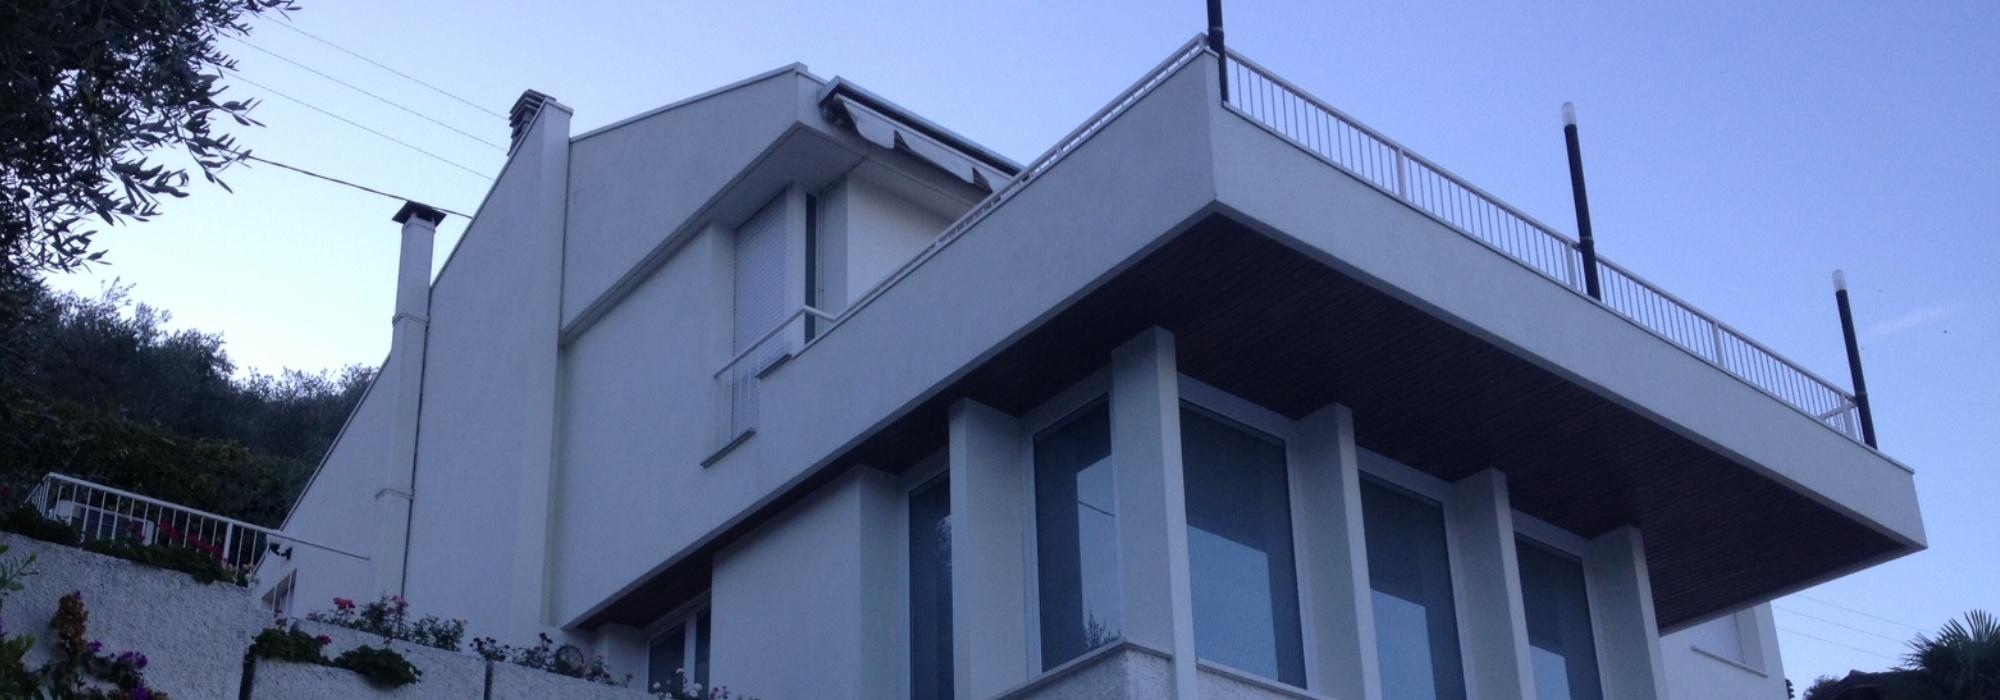 Villa singola – Brenzone sul Garda